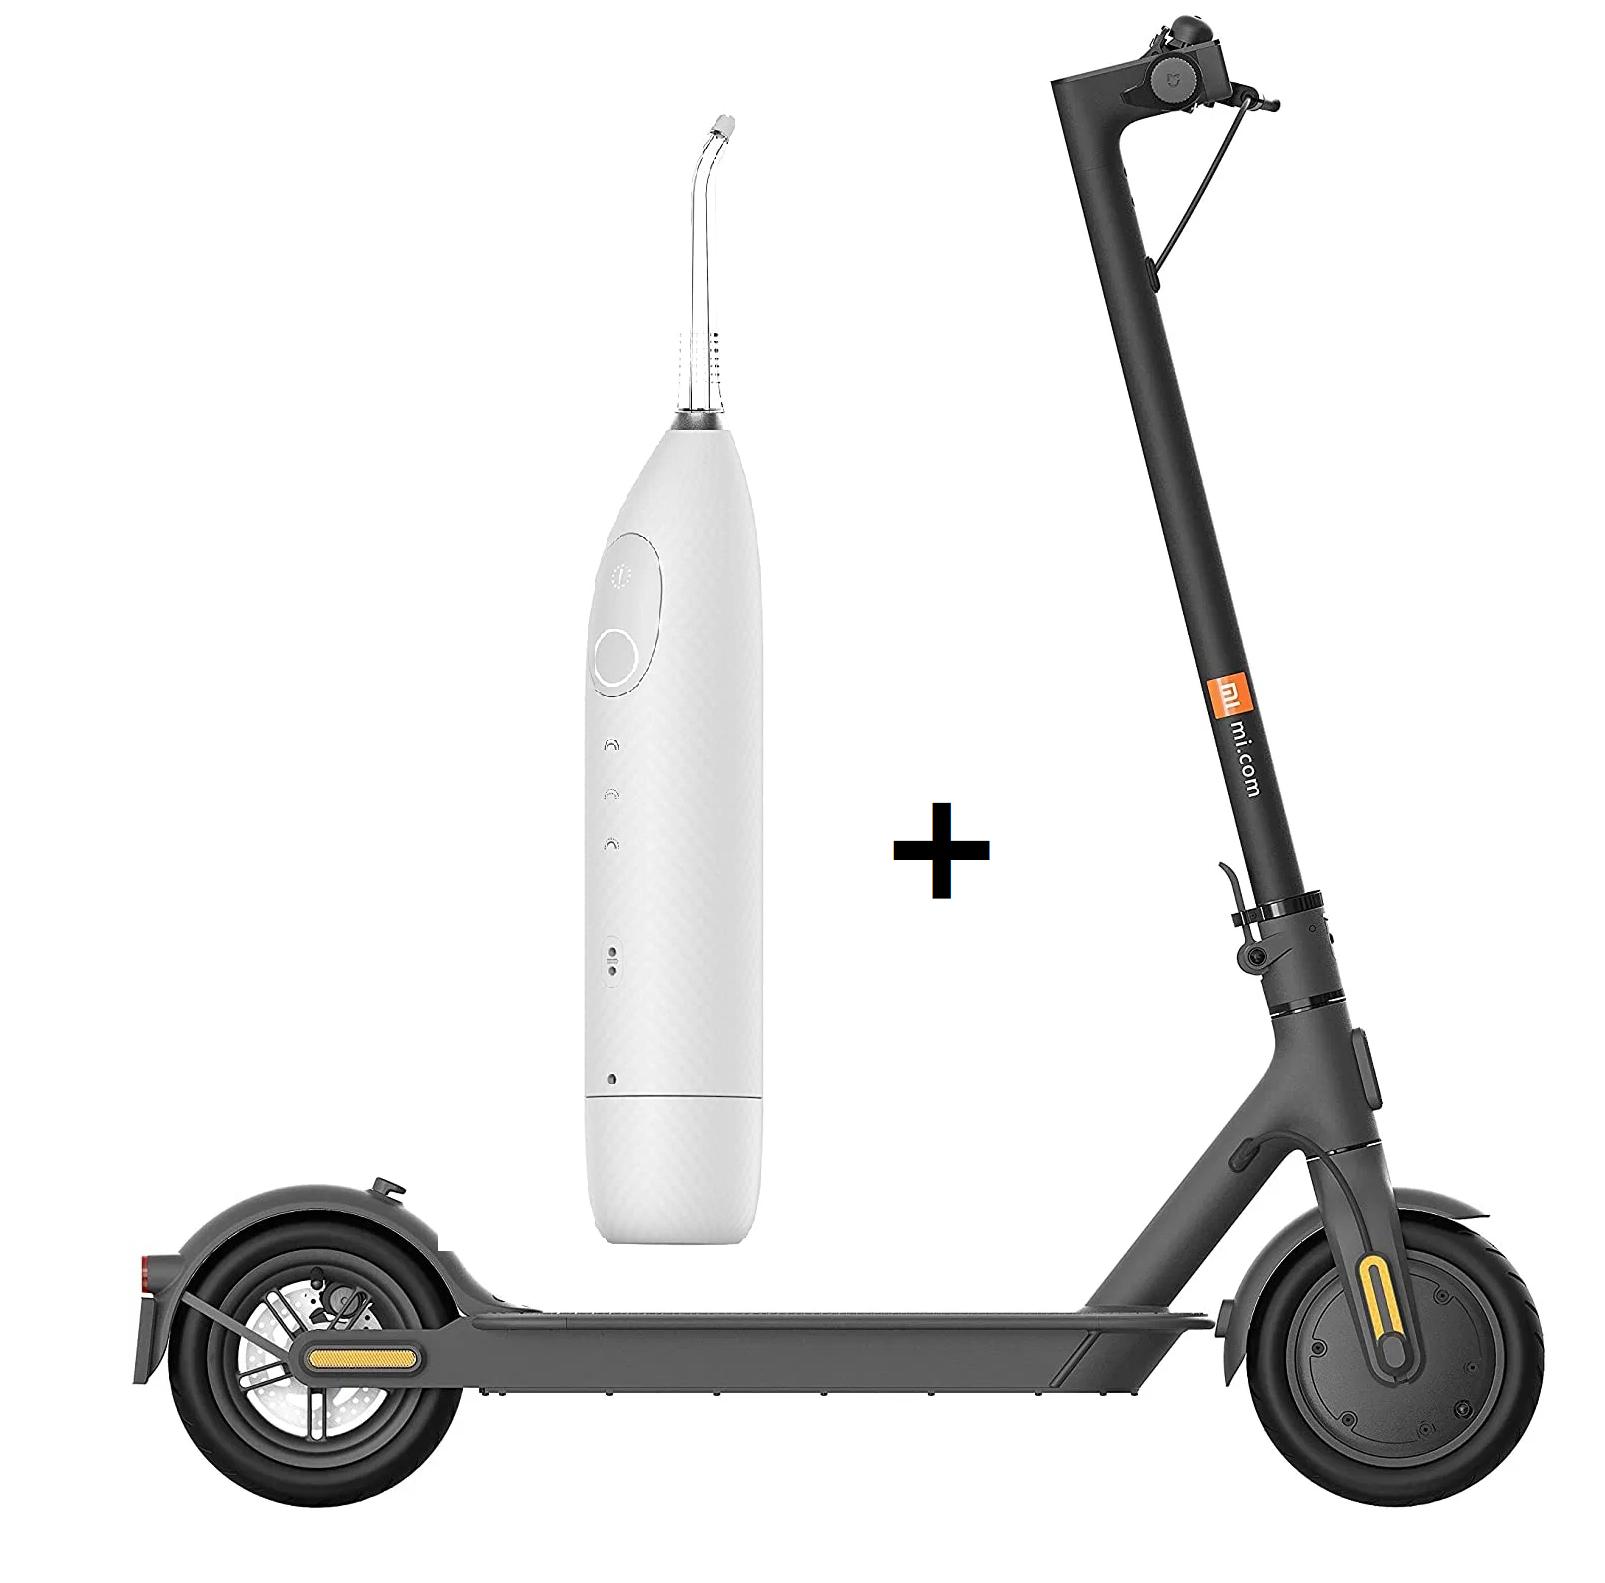 Xiaomi Scooter 1S +Irrigador Oclean W1 solo 279€ (desde Europa)